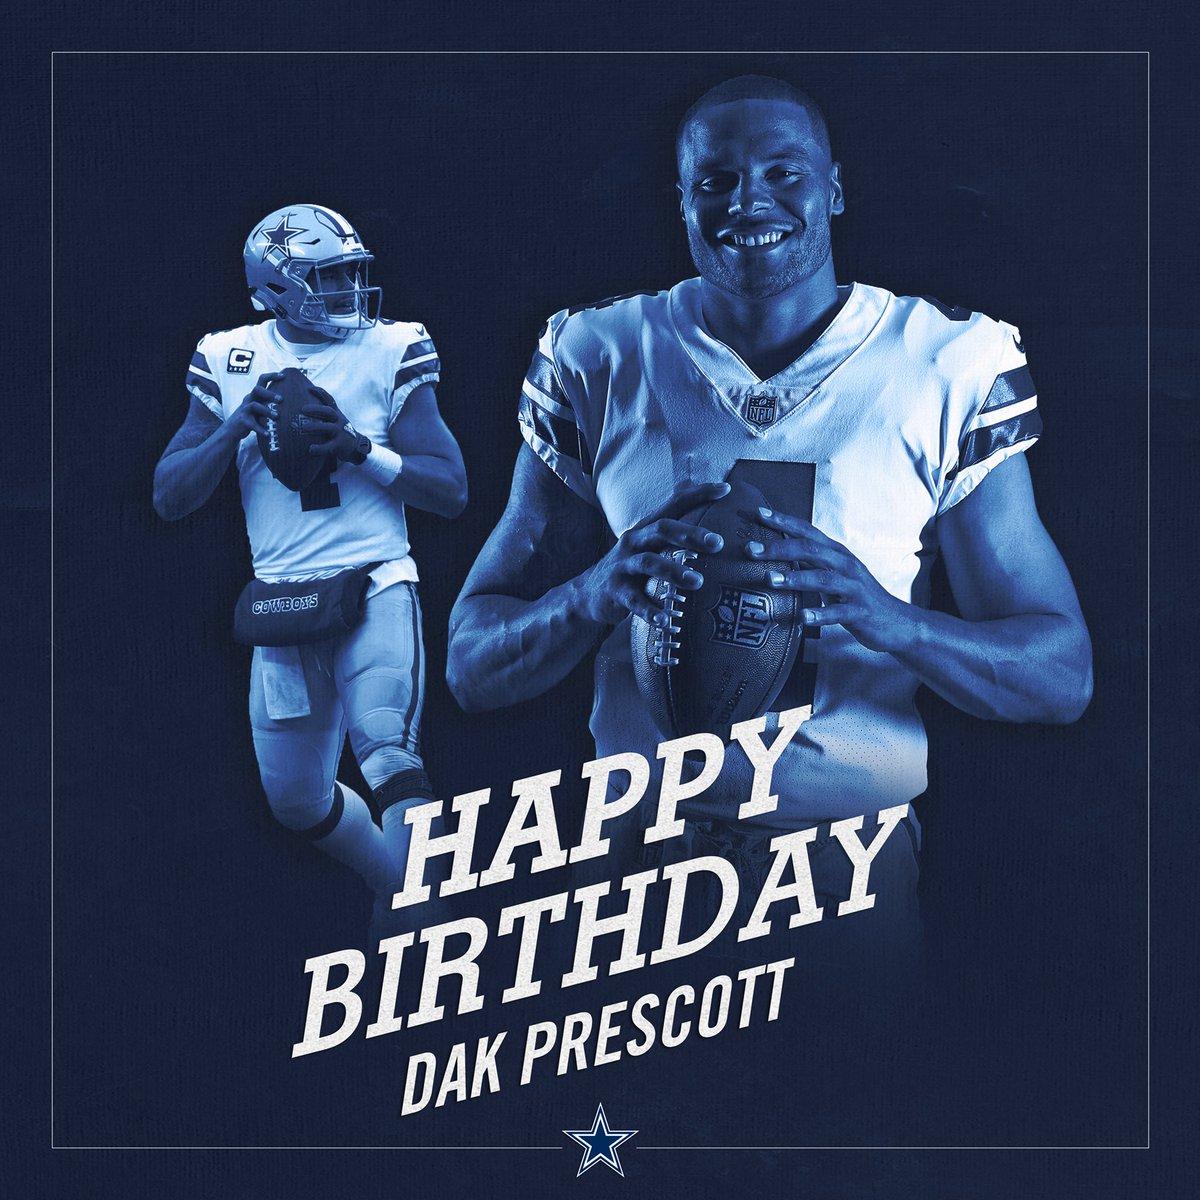 Dallas Cowboys On Twitter Cowboysnation Join Us In Wishing Dak A Happy Birthday